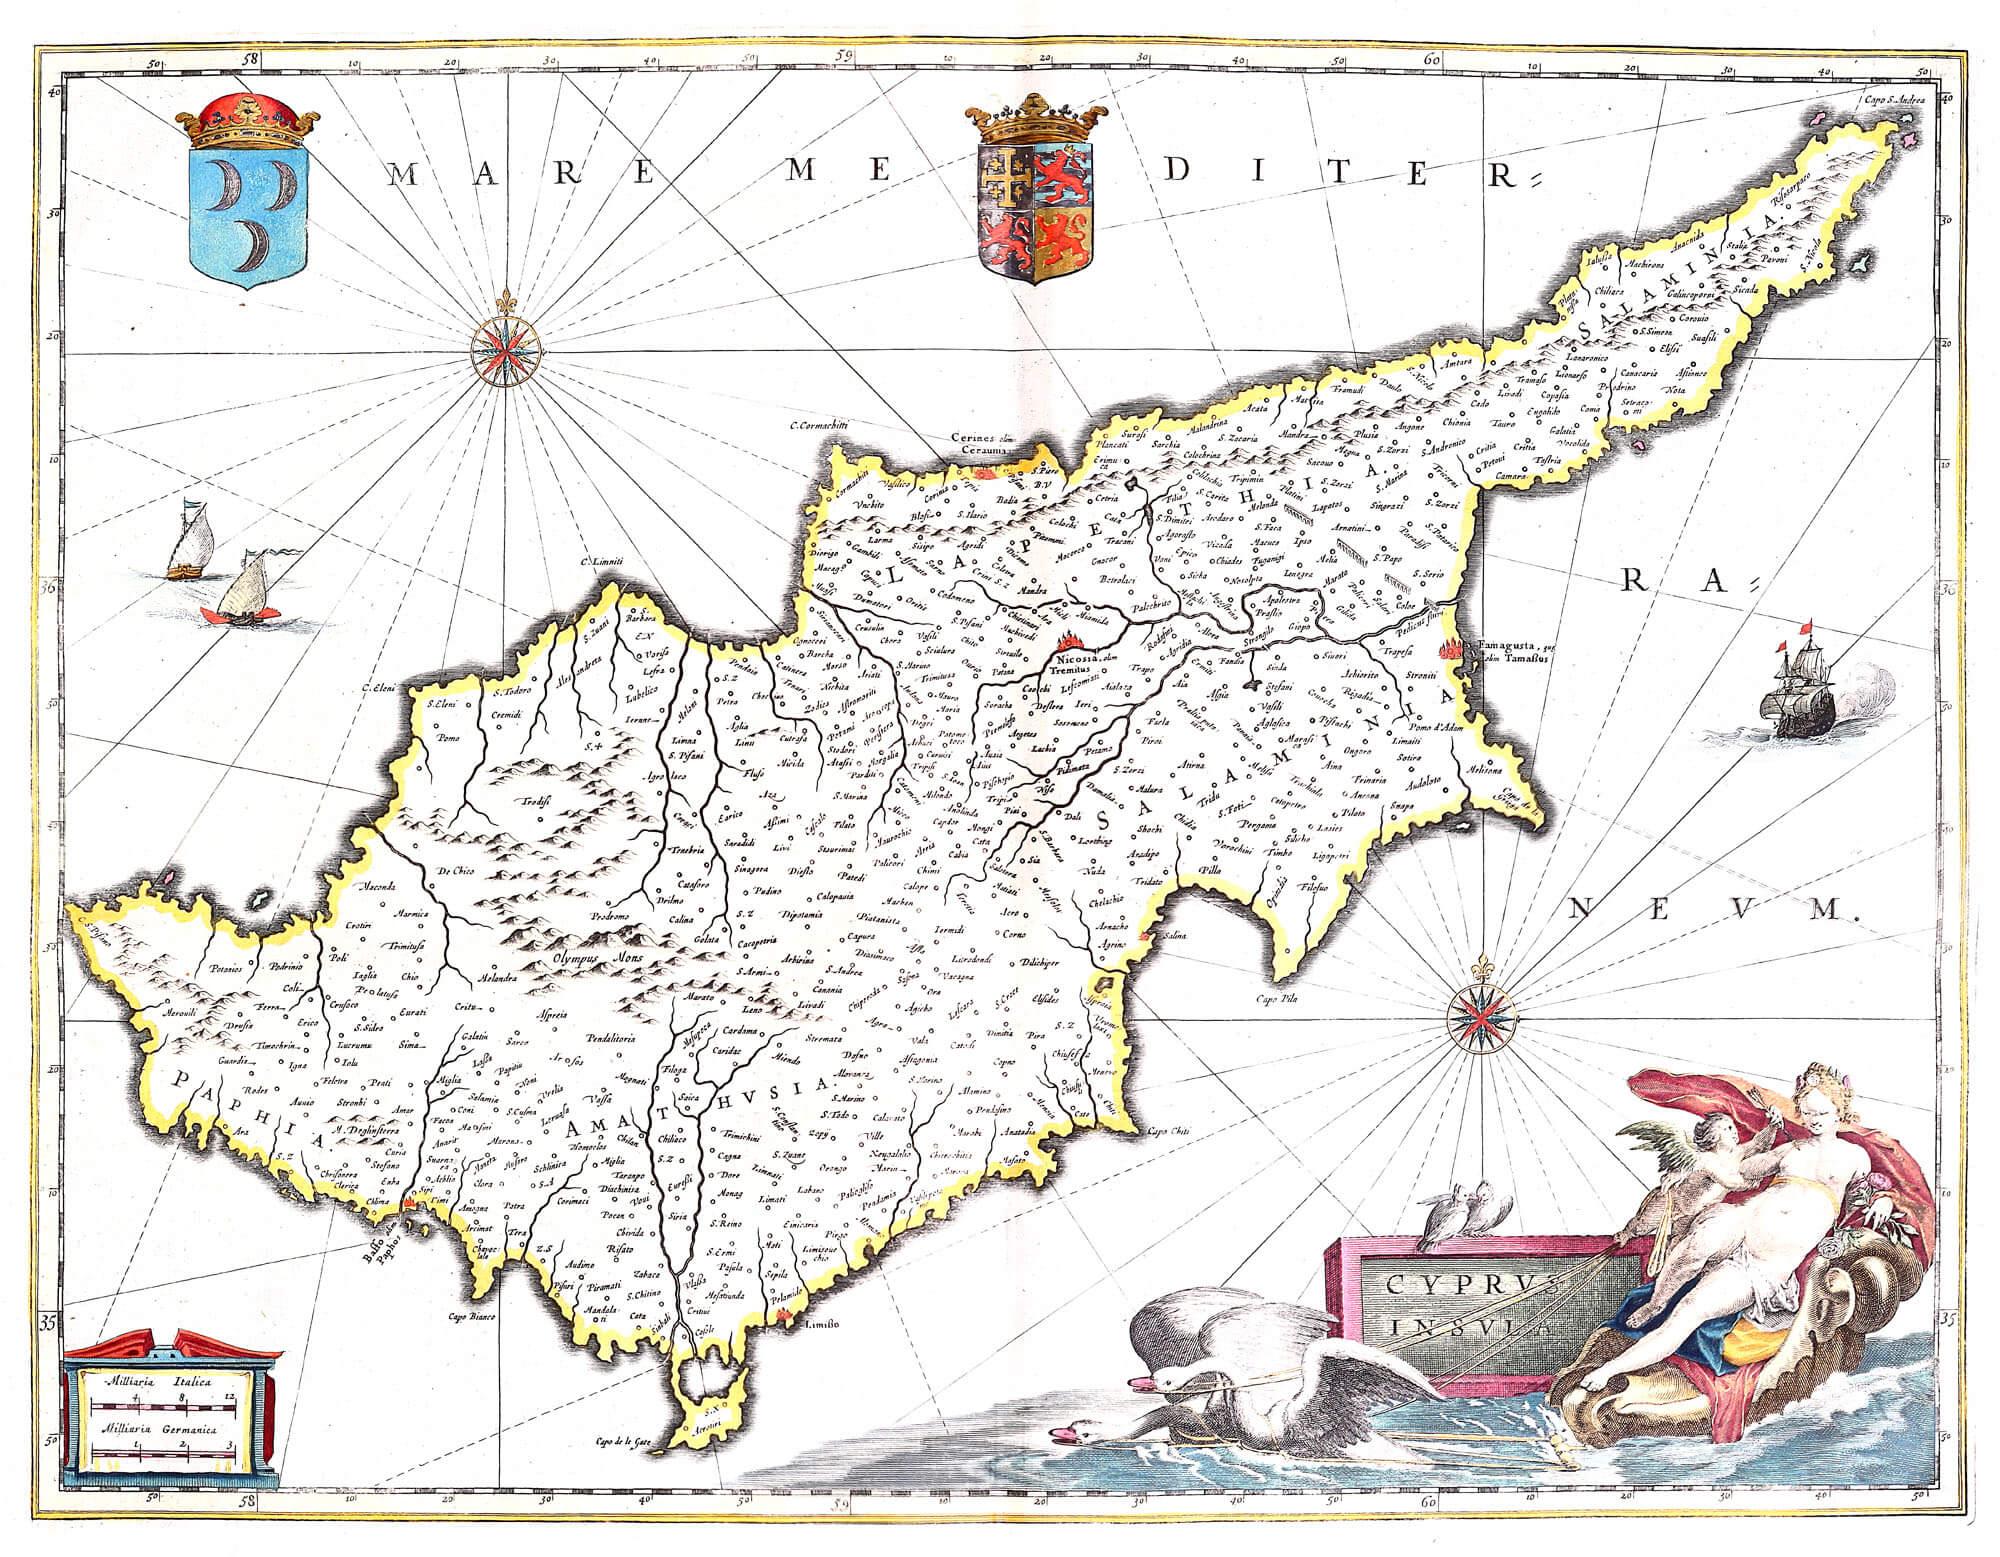 Atlas maior vol 10 z 1 31 blaeu 1662 turkey palestine china z 1 31 04 cyprus gumiabroncs Gallery